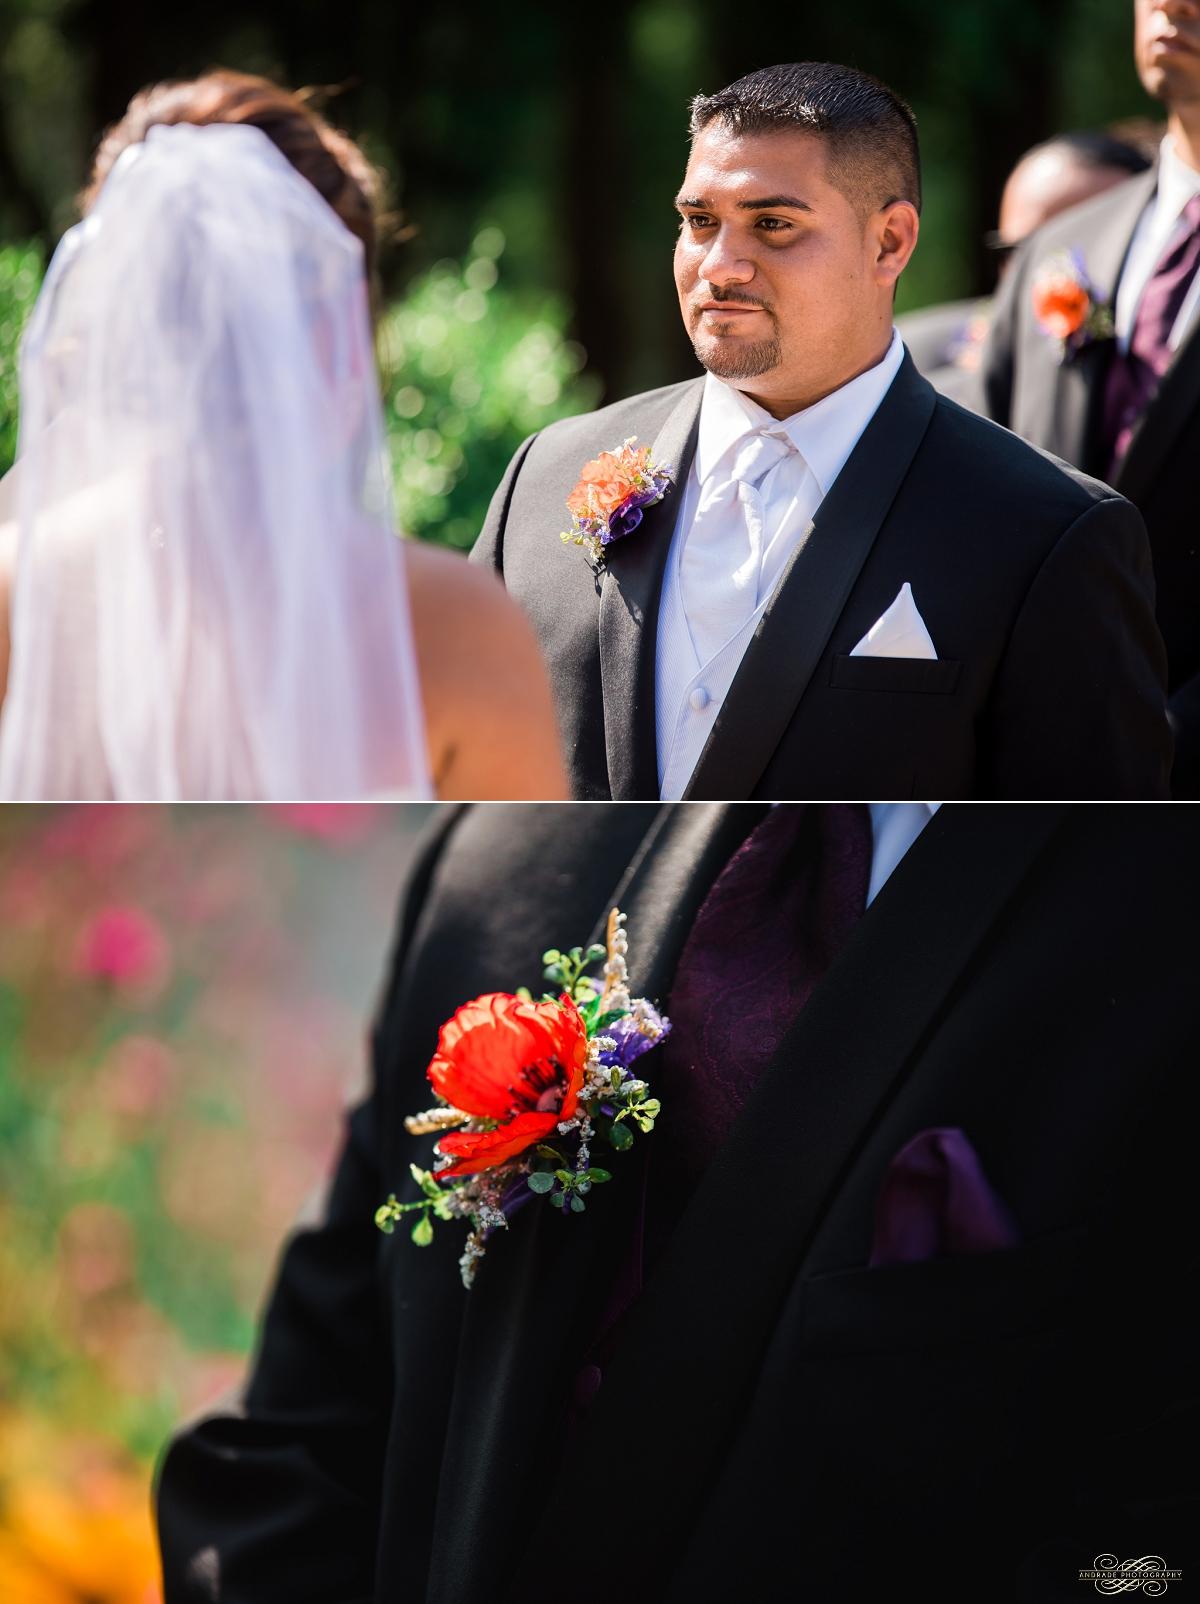 Janette + Louie Estebans Wedding Photography in Naperville - Naperville Wedding Photographer_0038.jpg